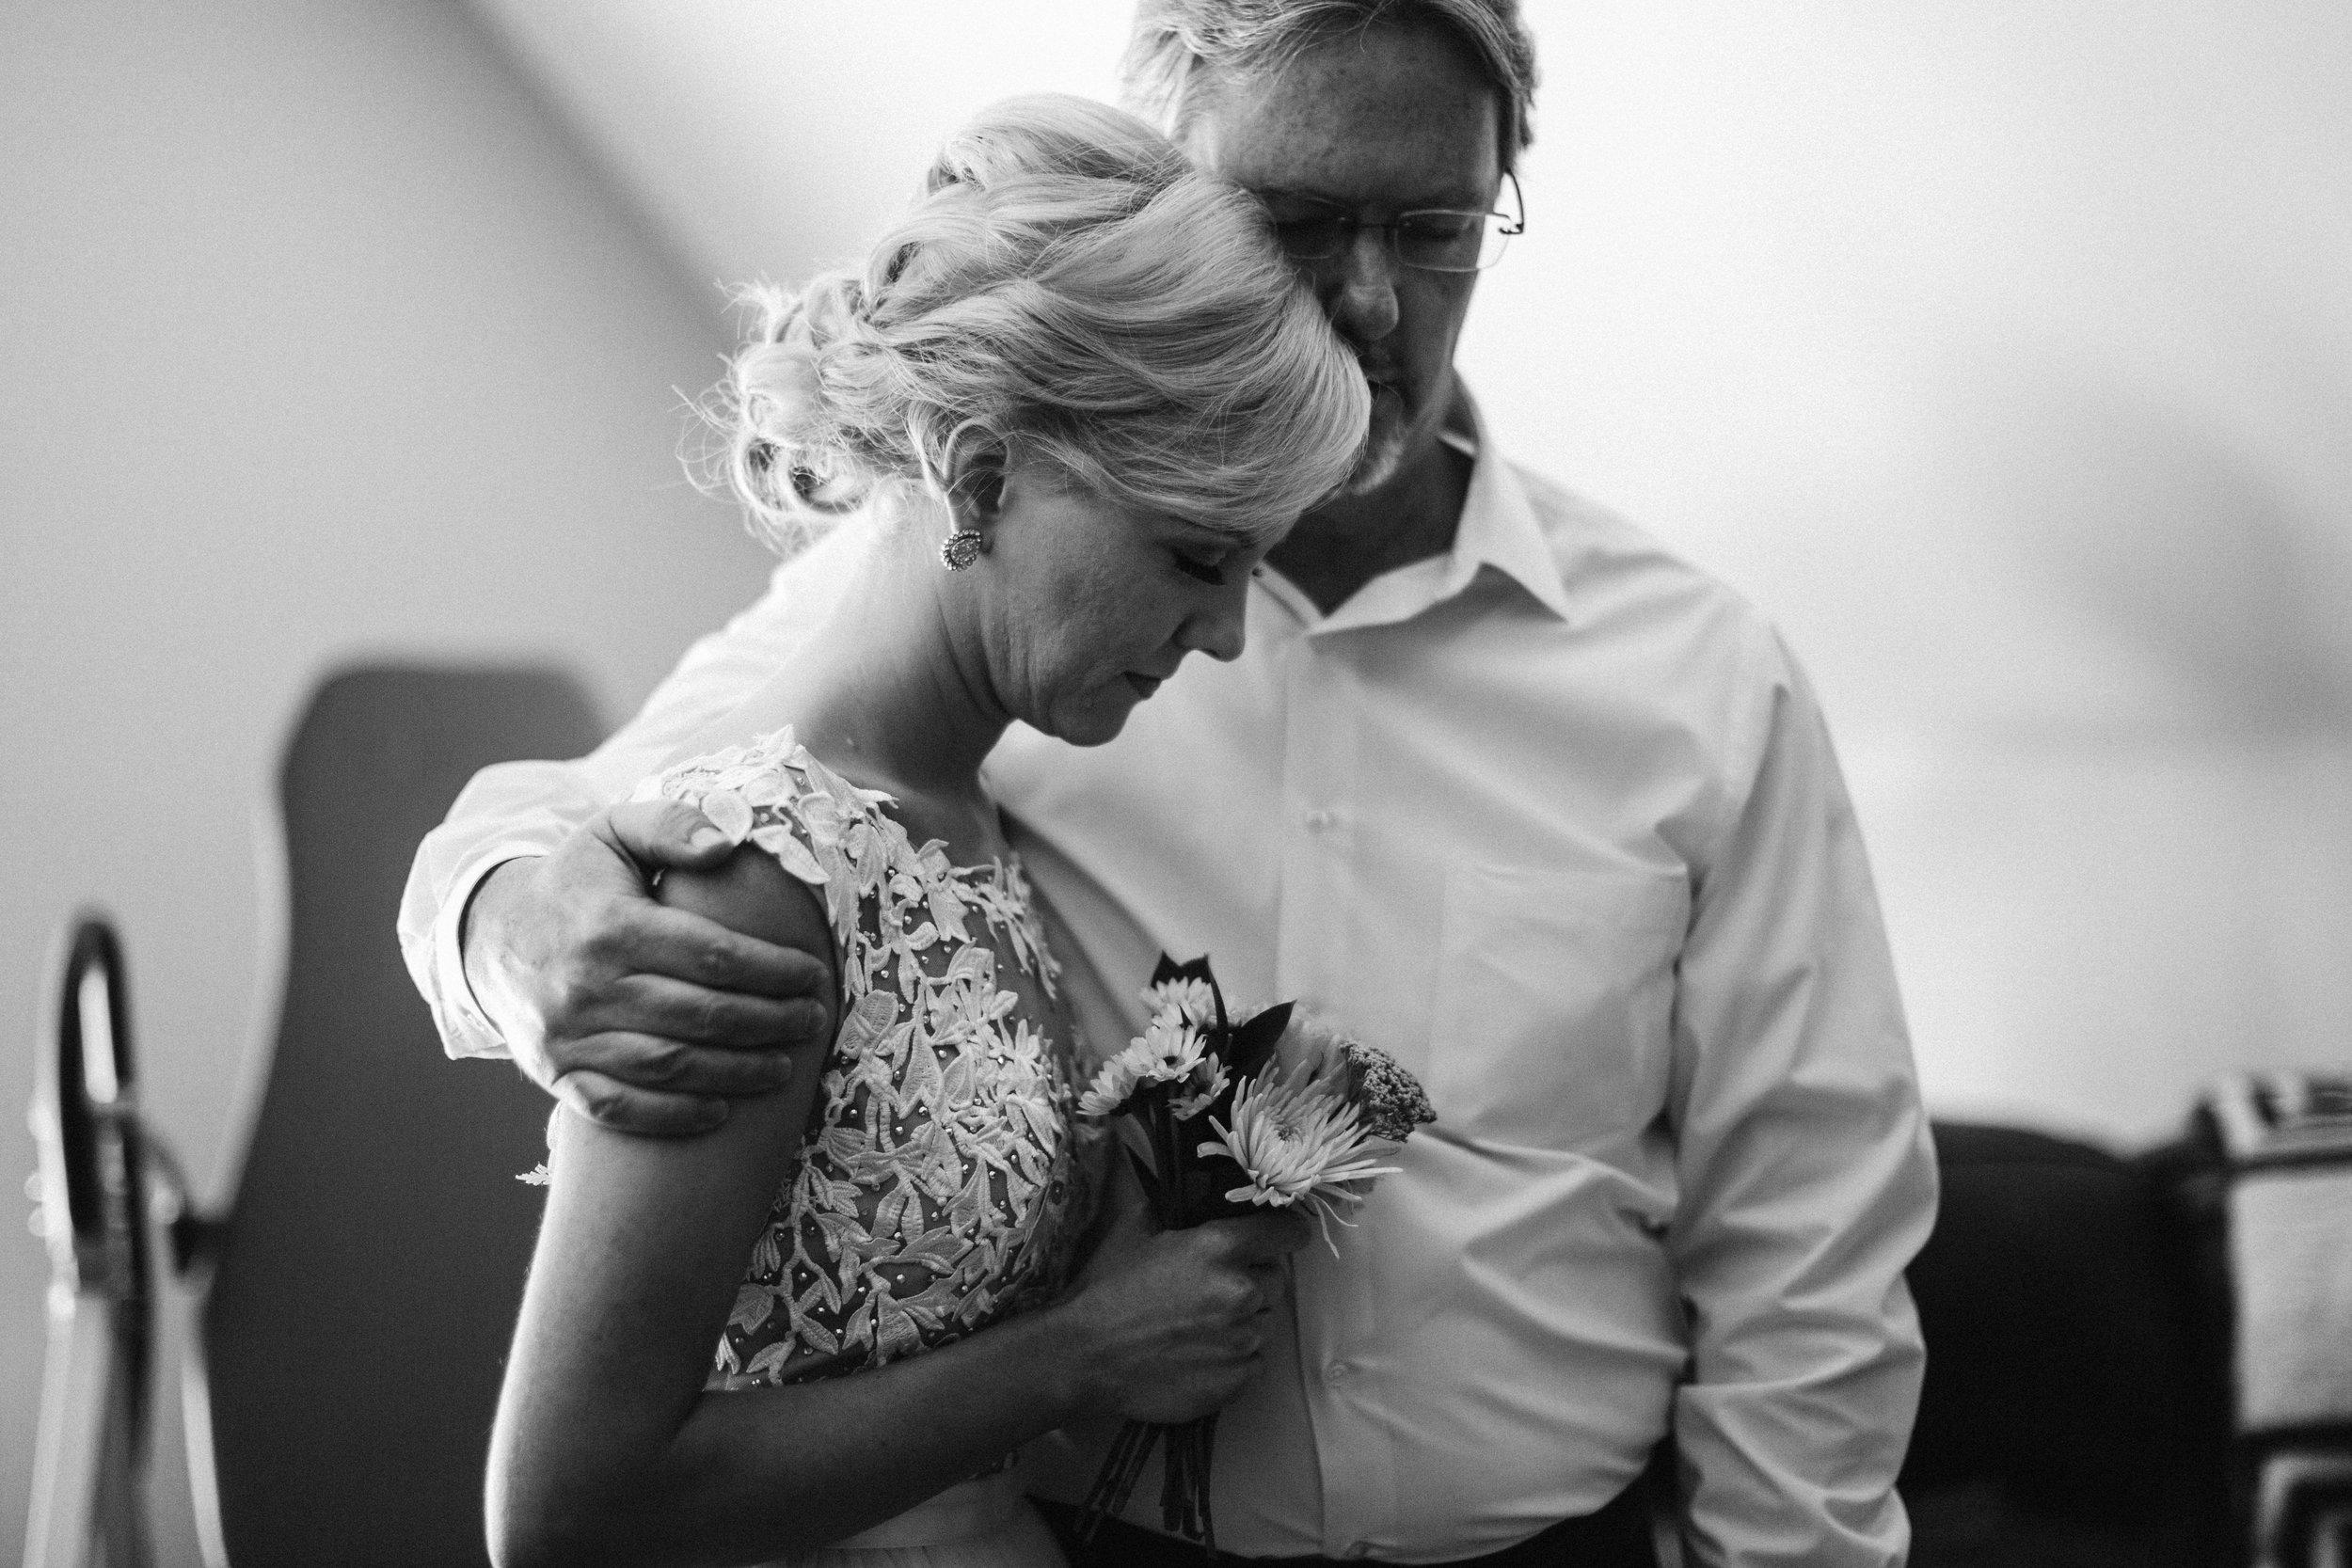 2018.09.02 Ray and Sarah Prizner Nashville TN Wedding FINALS-220.jpg